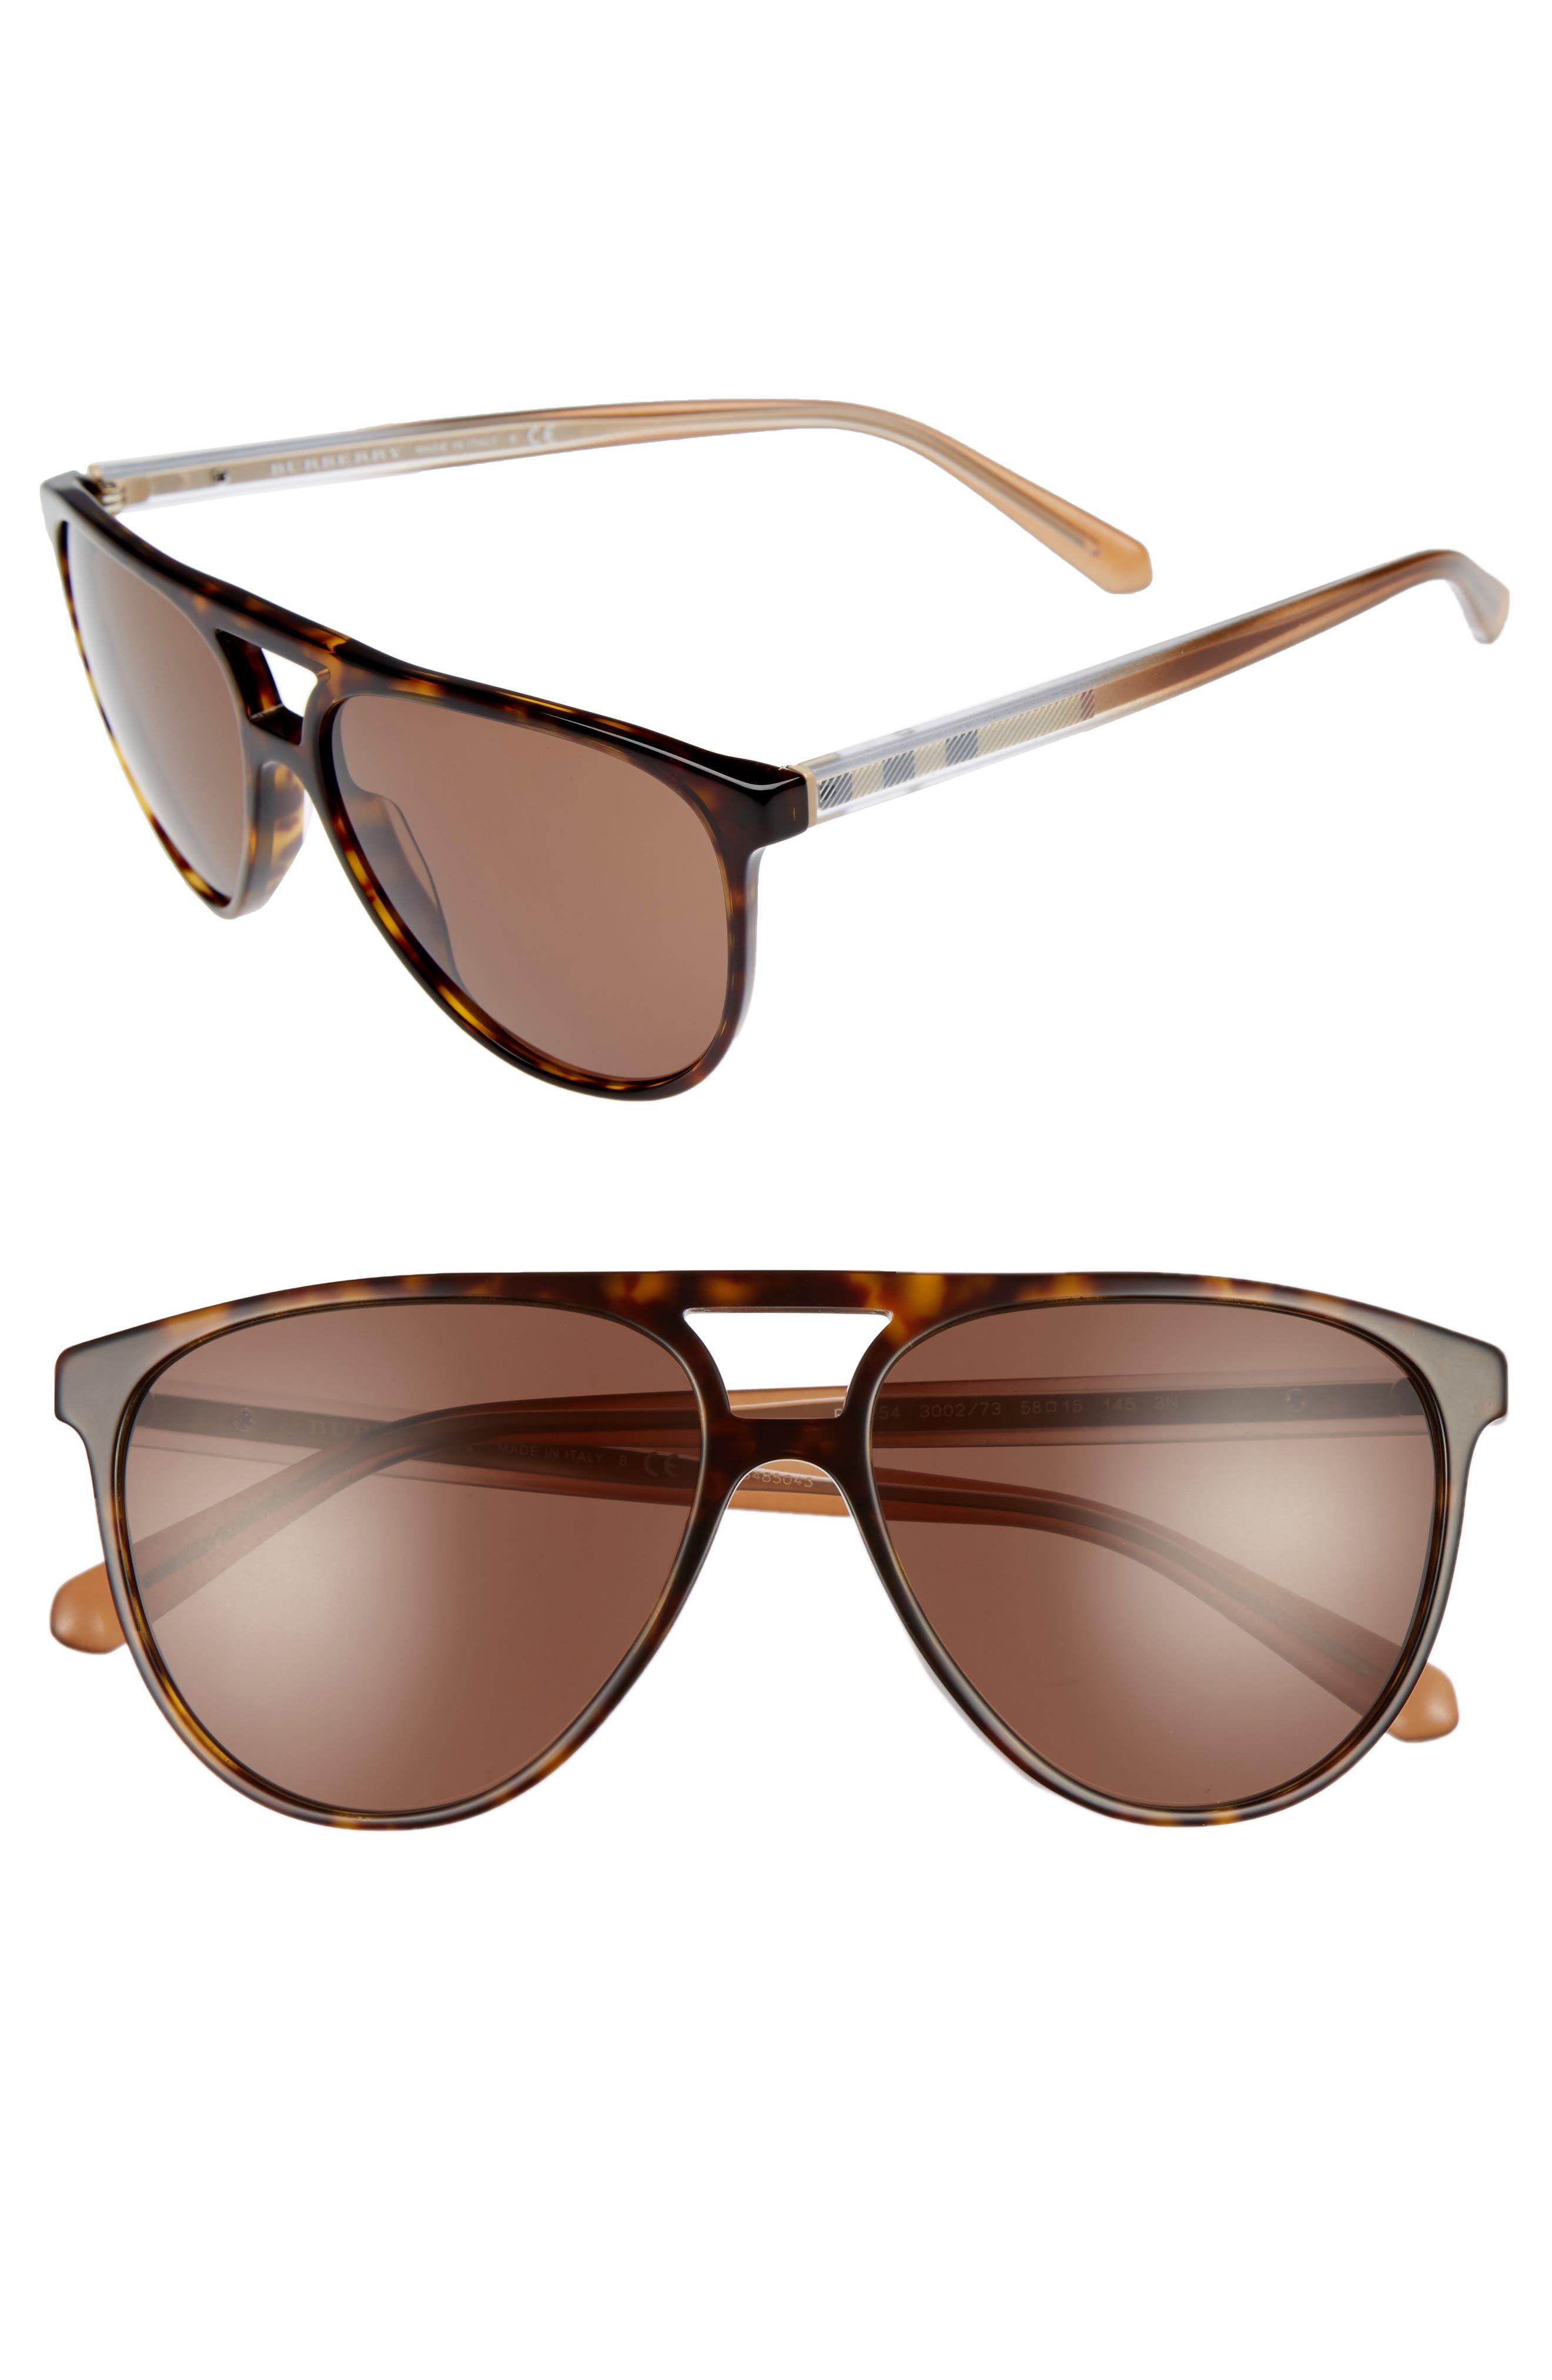 Alternate Image 1 Selected - Burberry 58mm Aviator Sunglasses